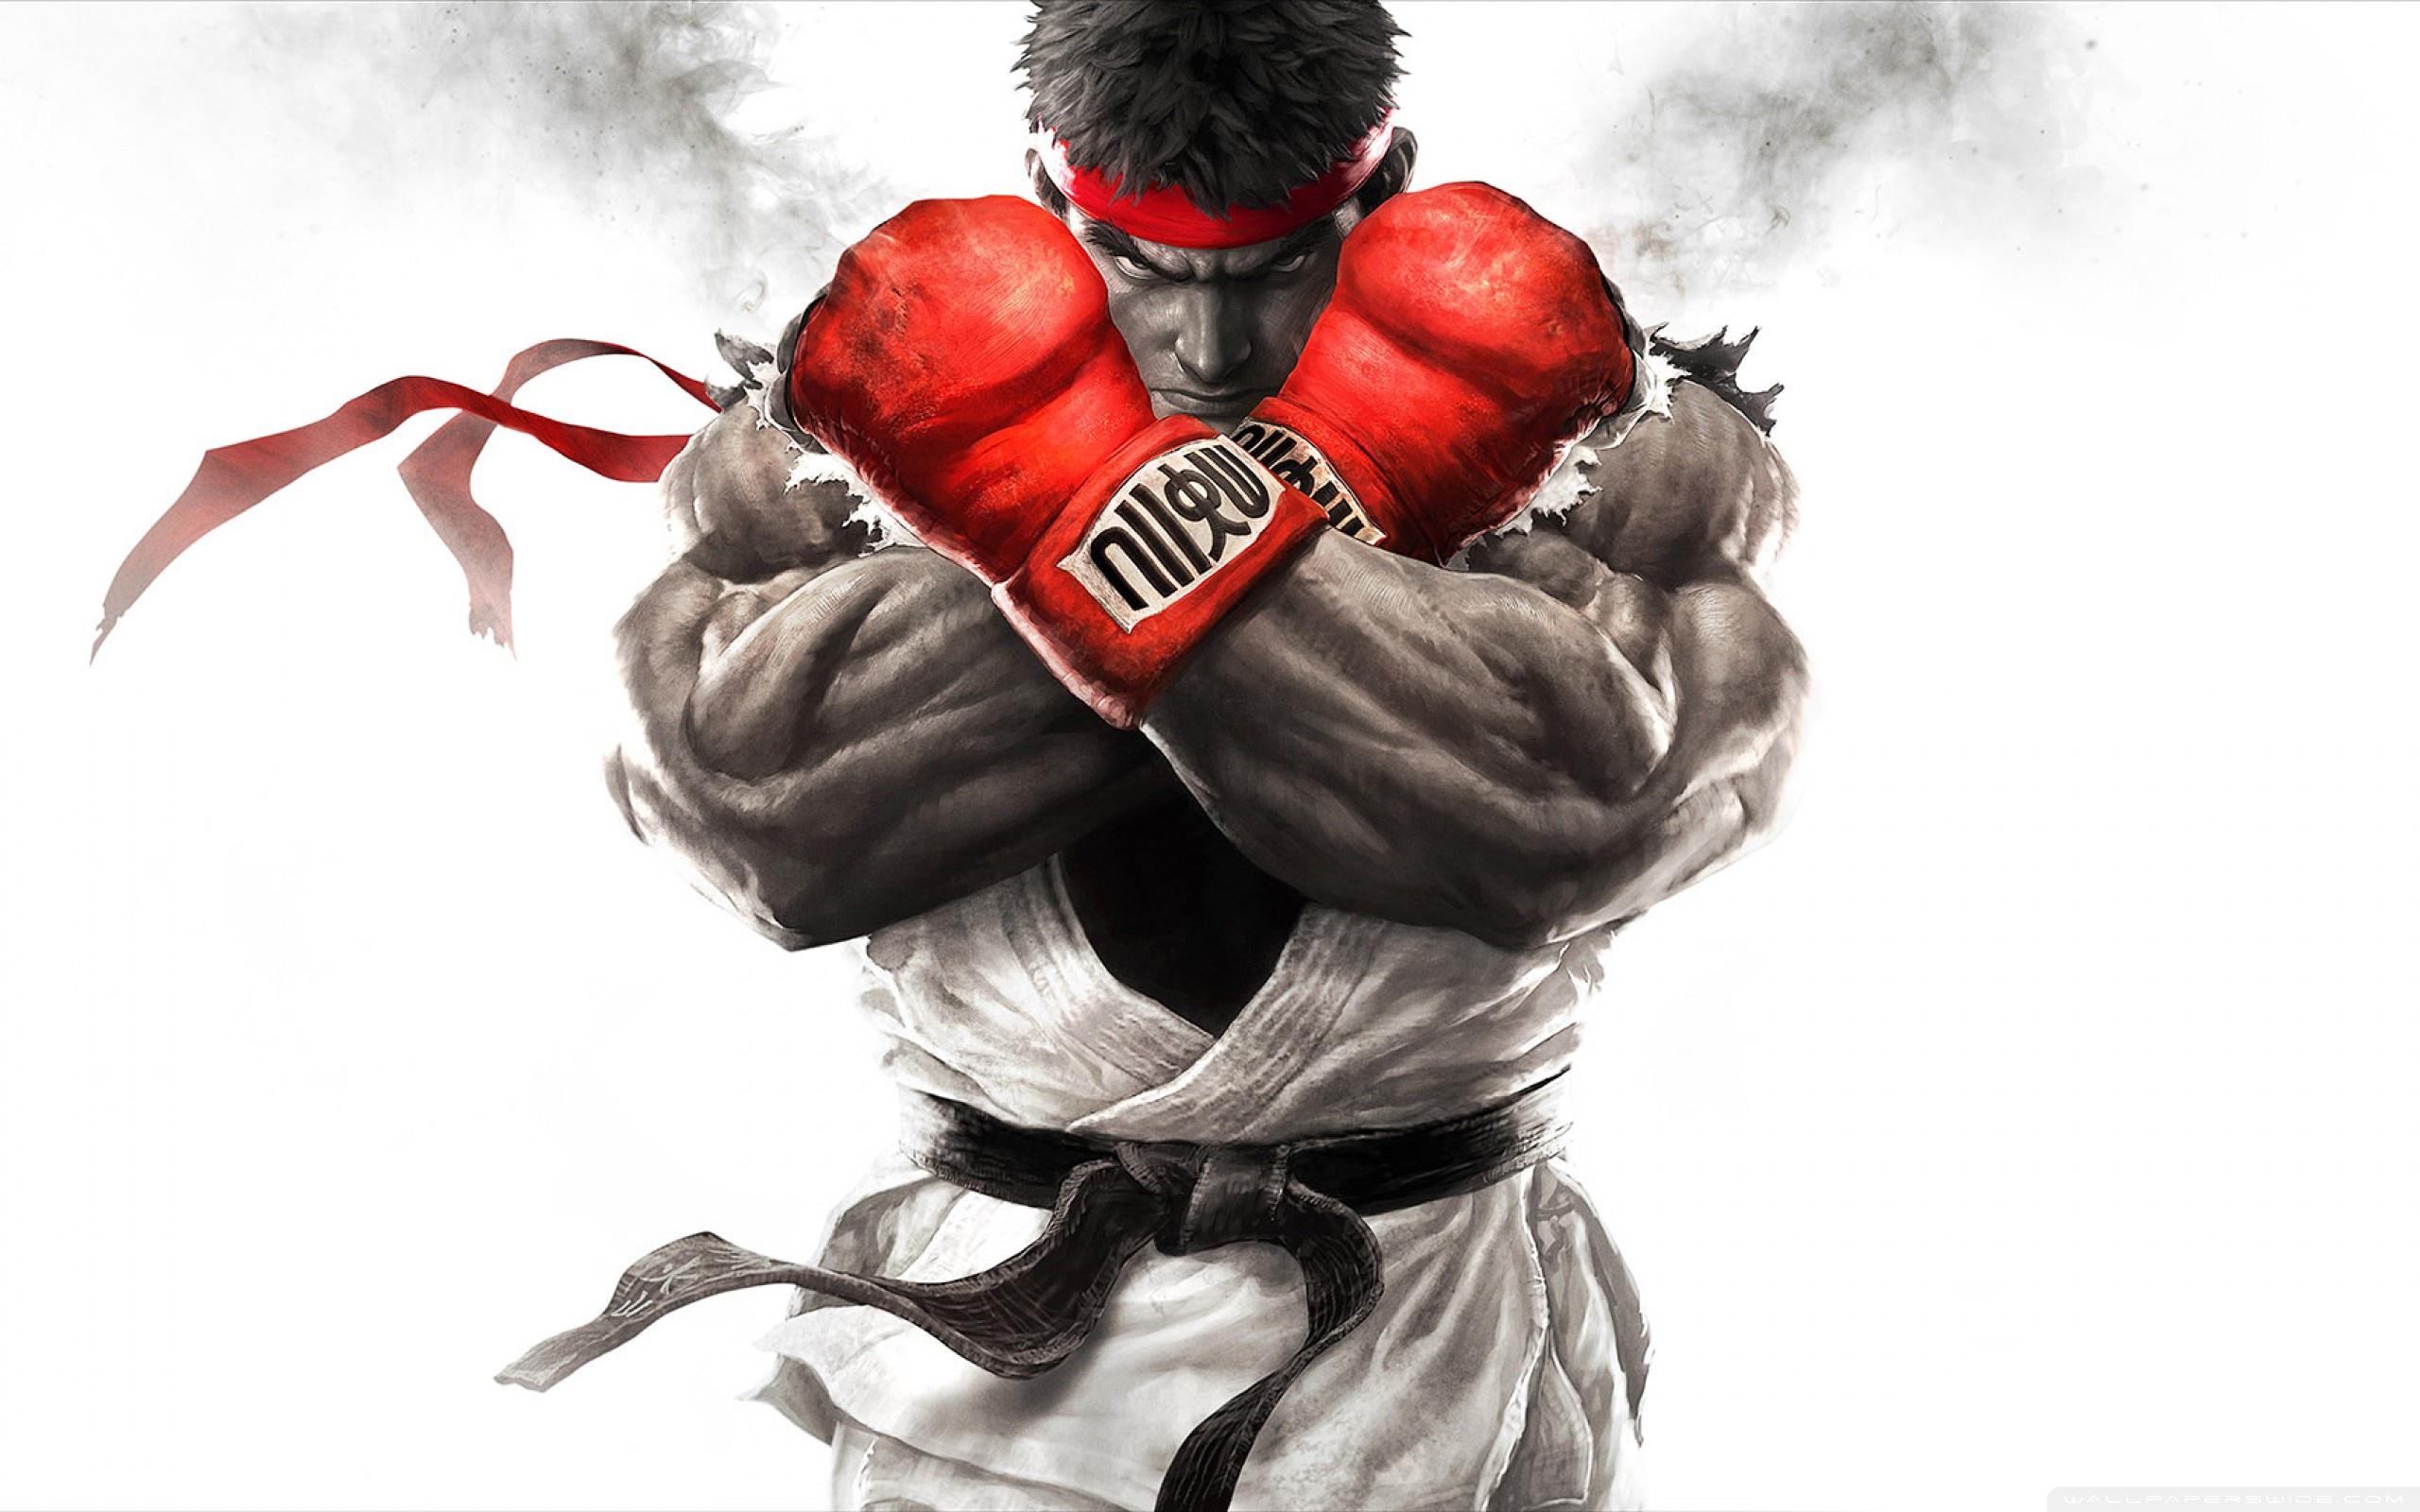 WallpapersWide com | Street Fighter HD Desktop Wallpapers for